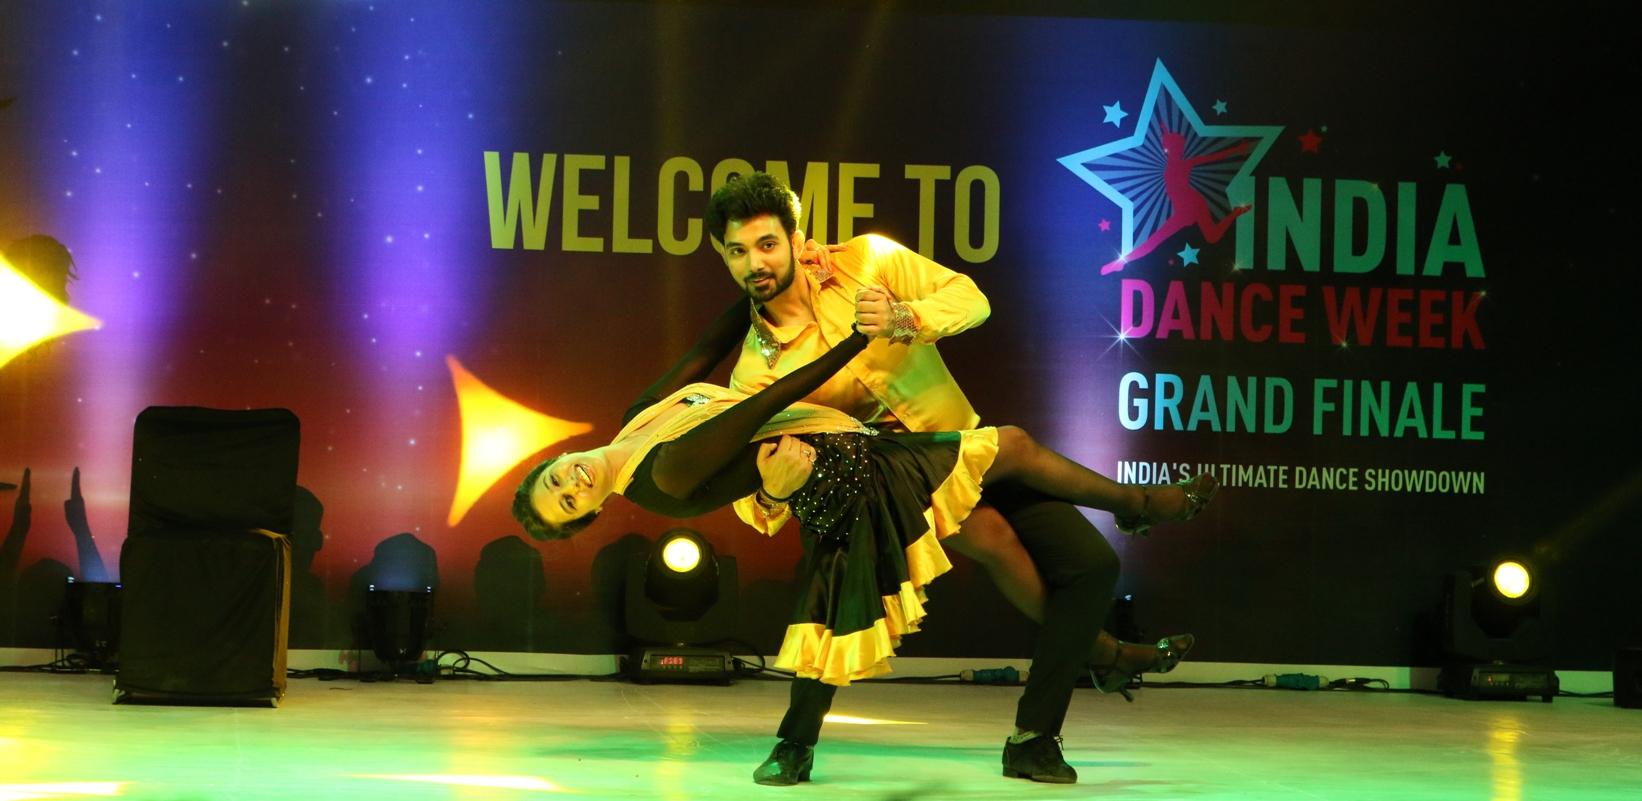 Dance Performance at India Dance Week, 2nd Edition, Phoenix Marketcity Kurla